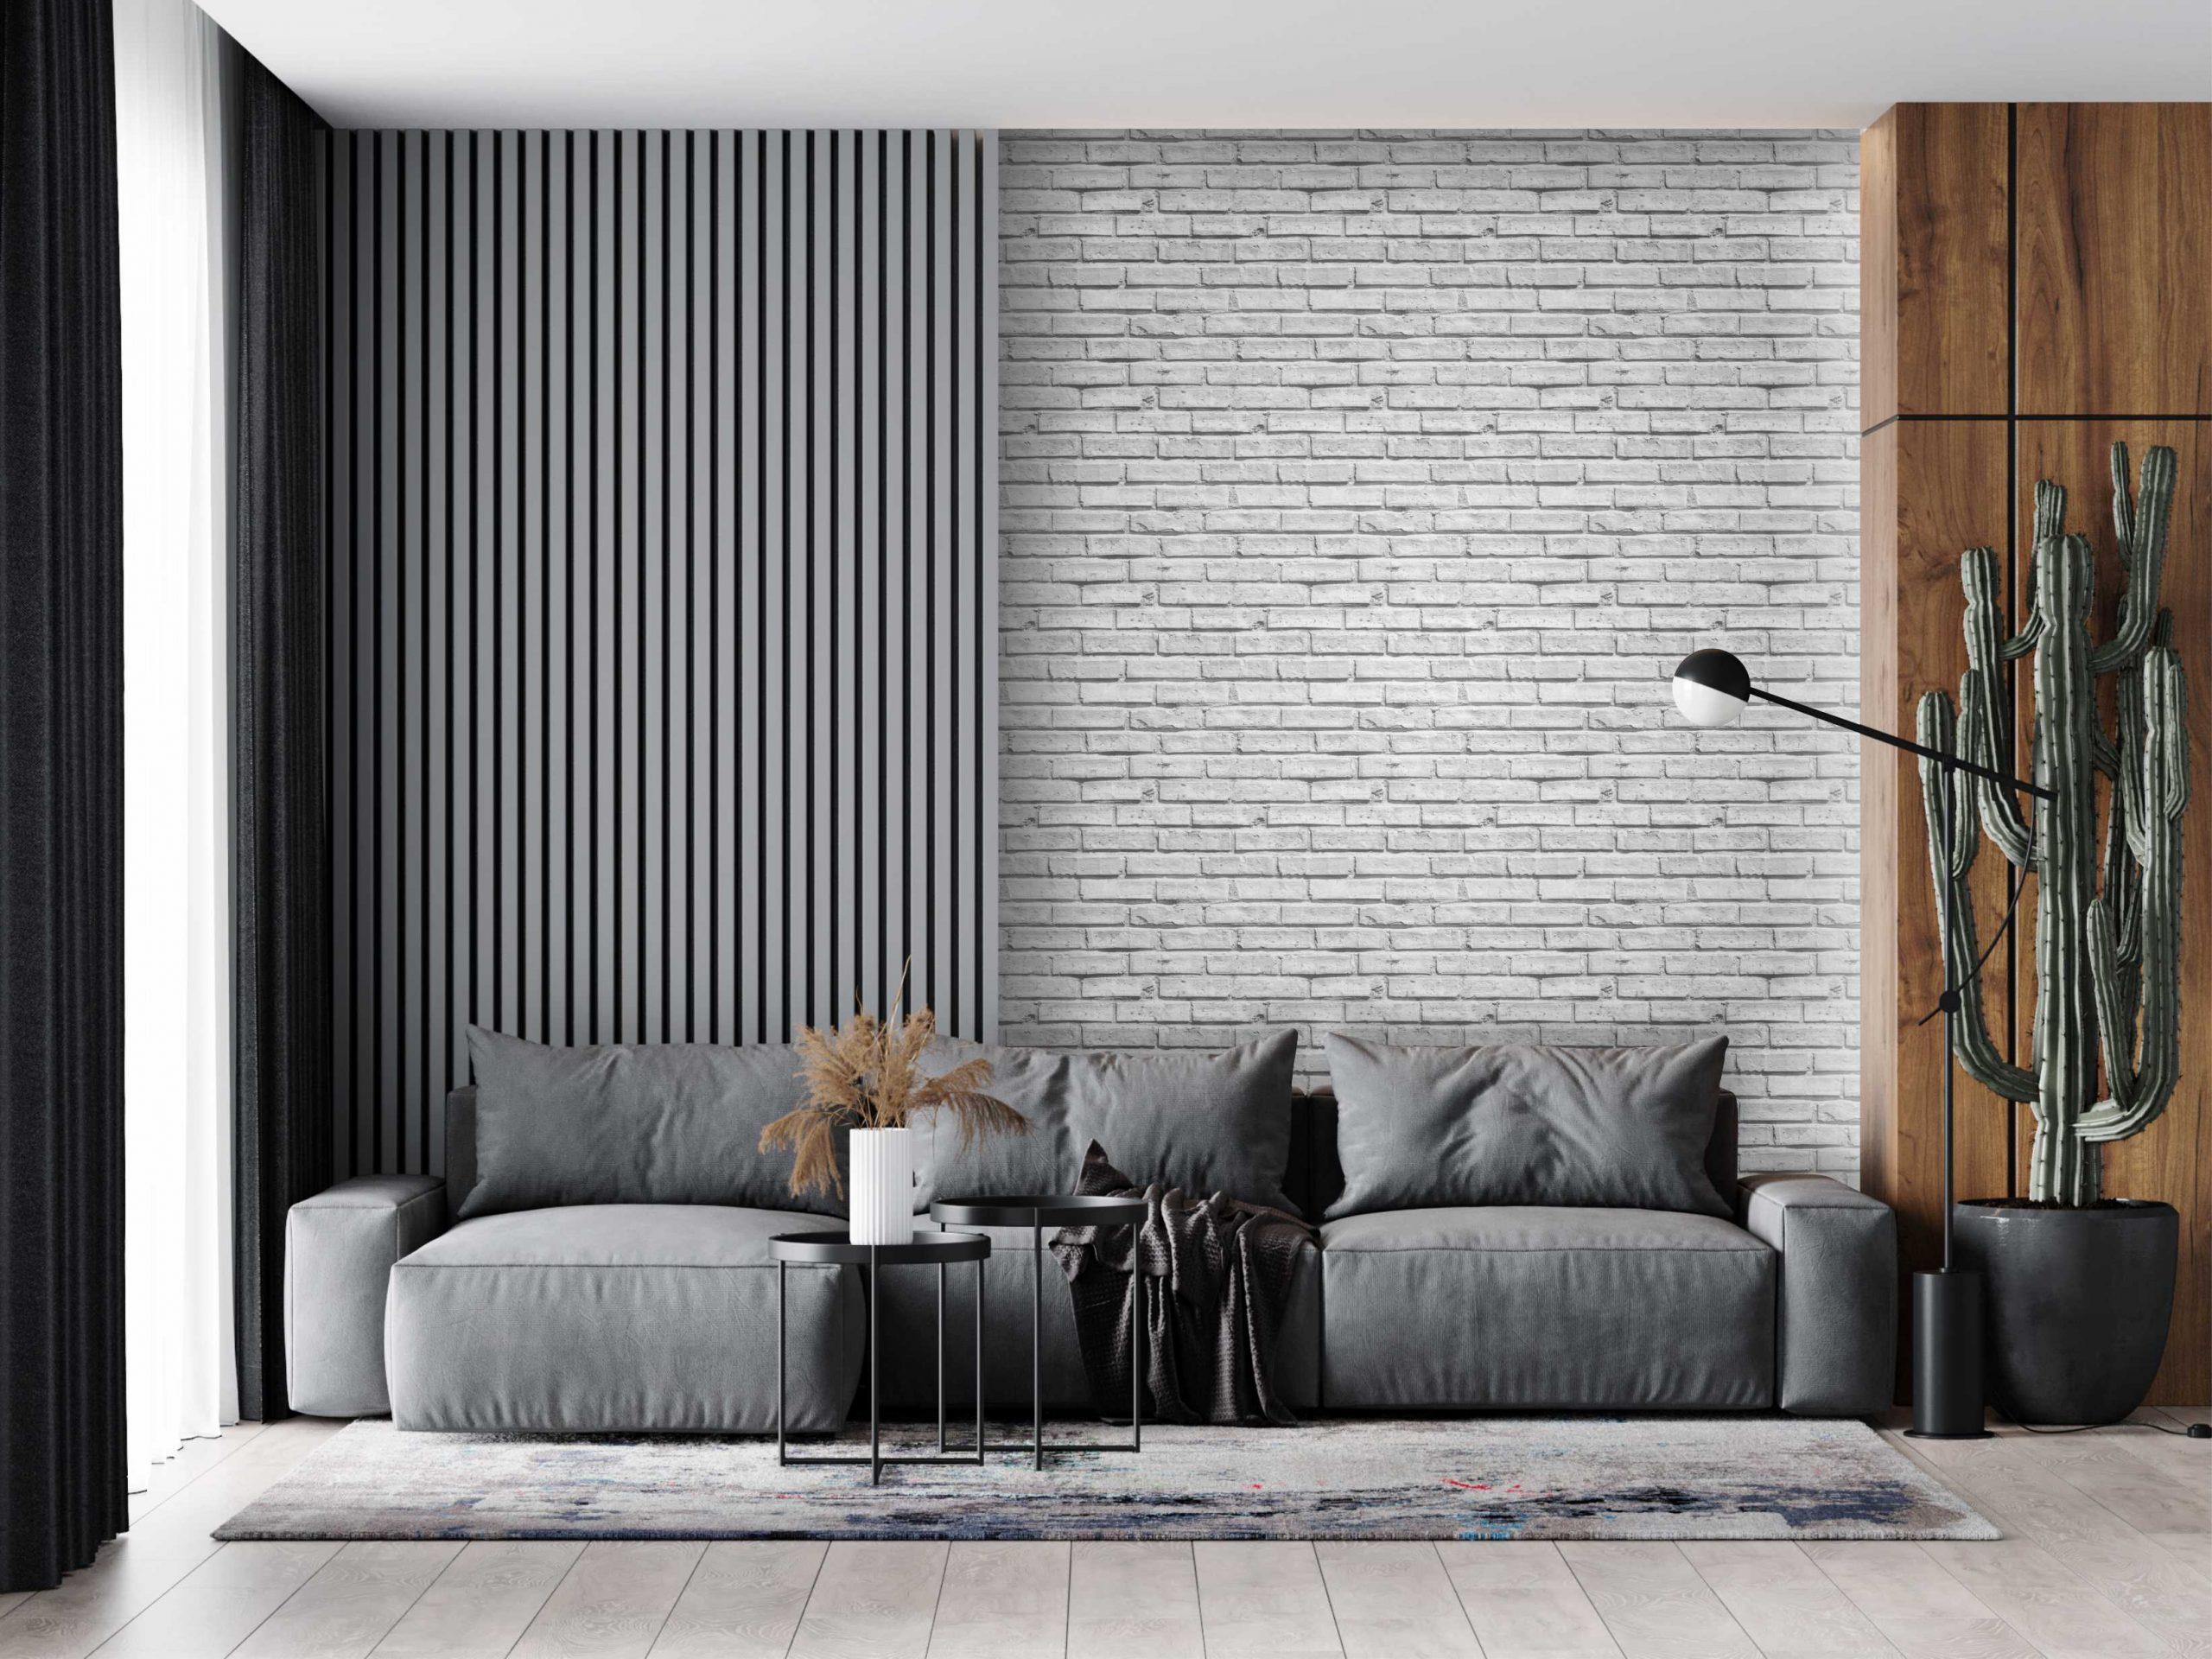 Papéis de parede para o estilo industrial